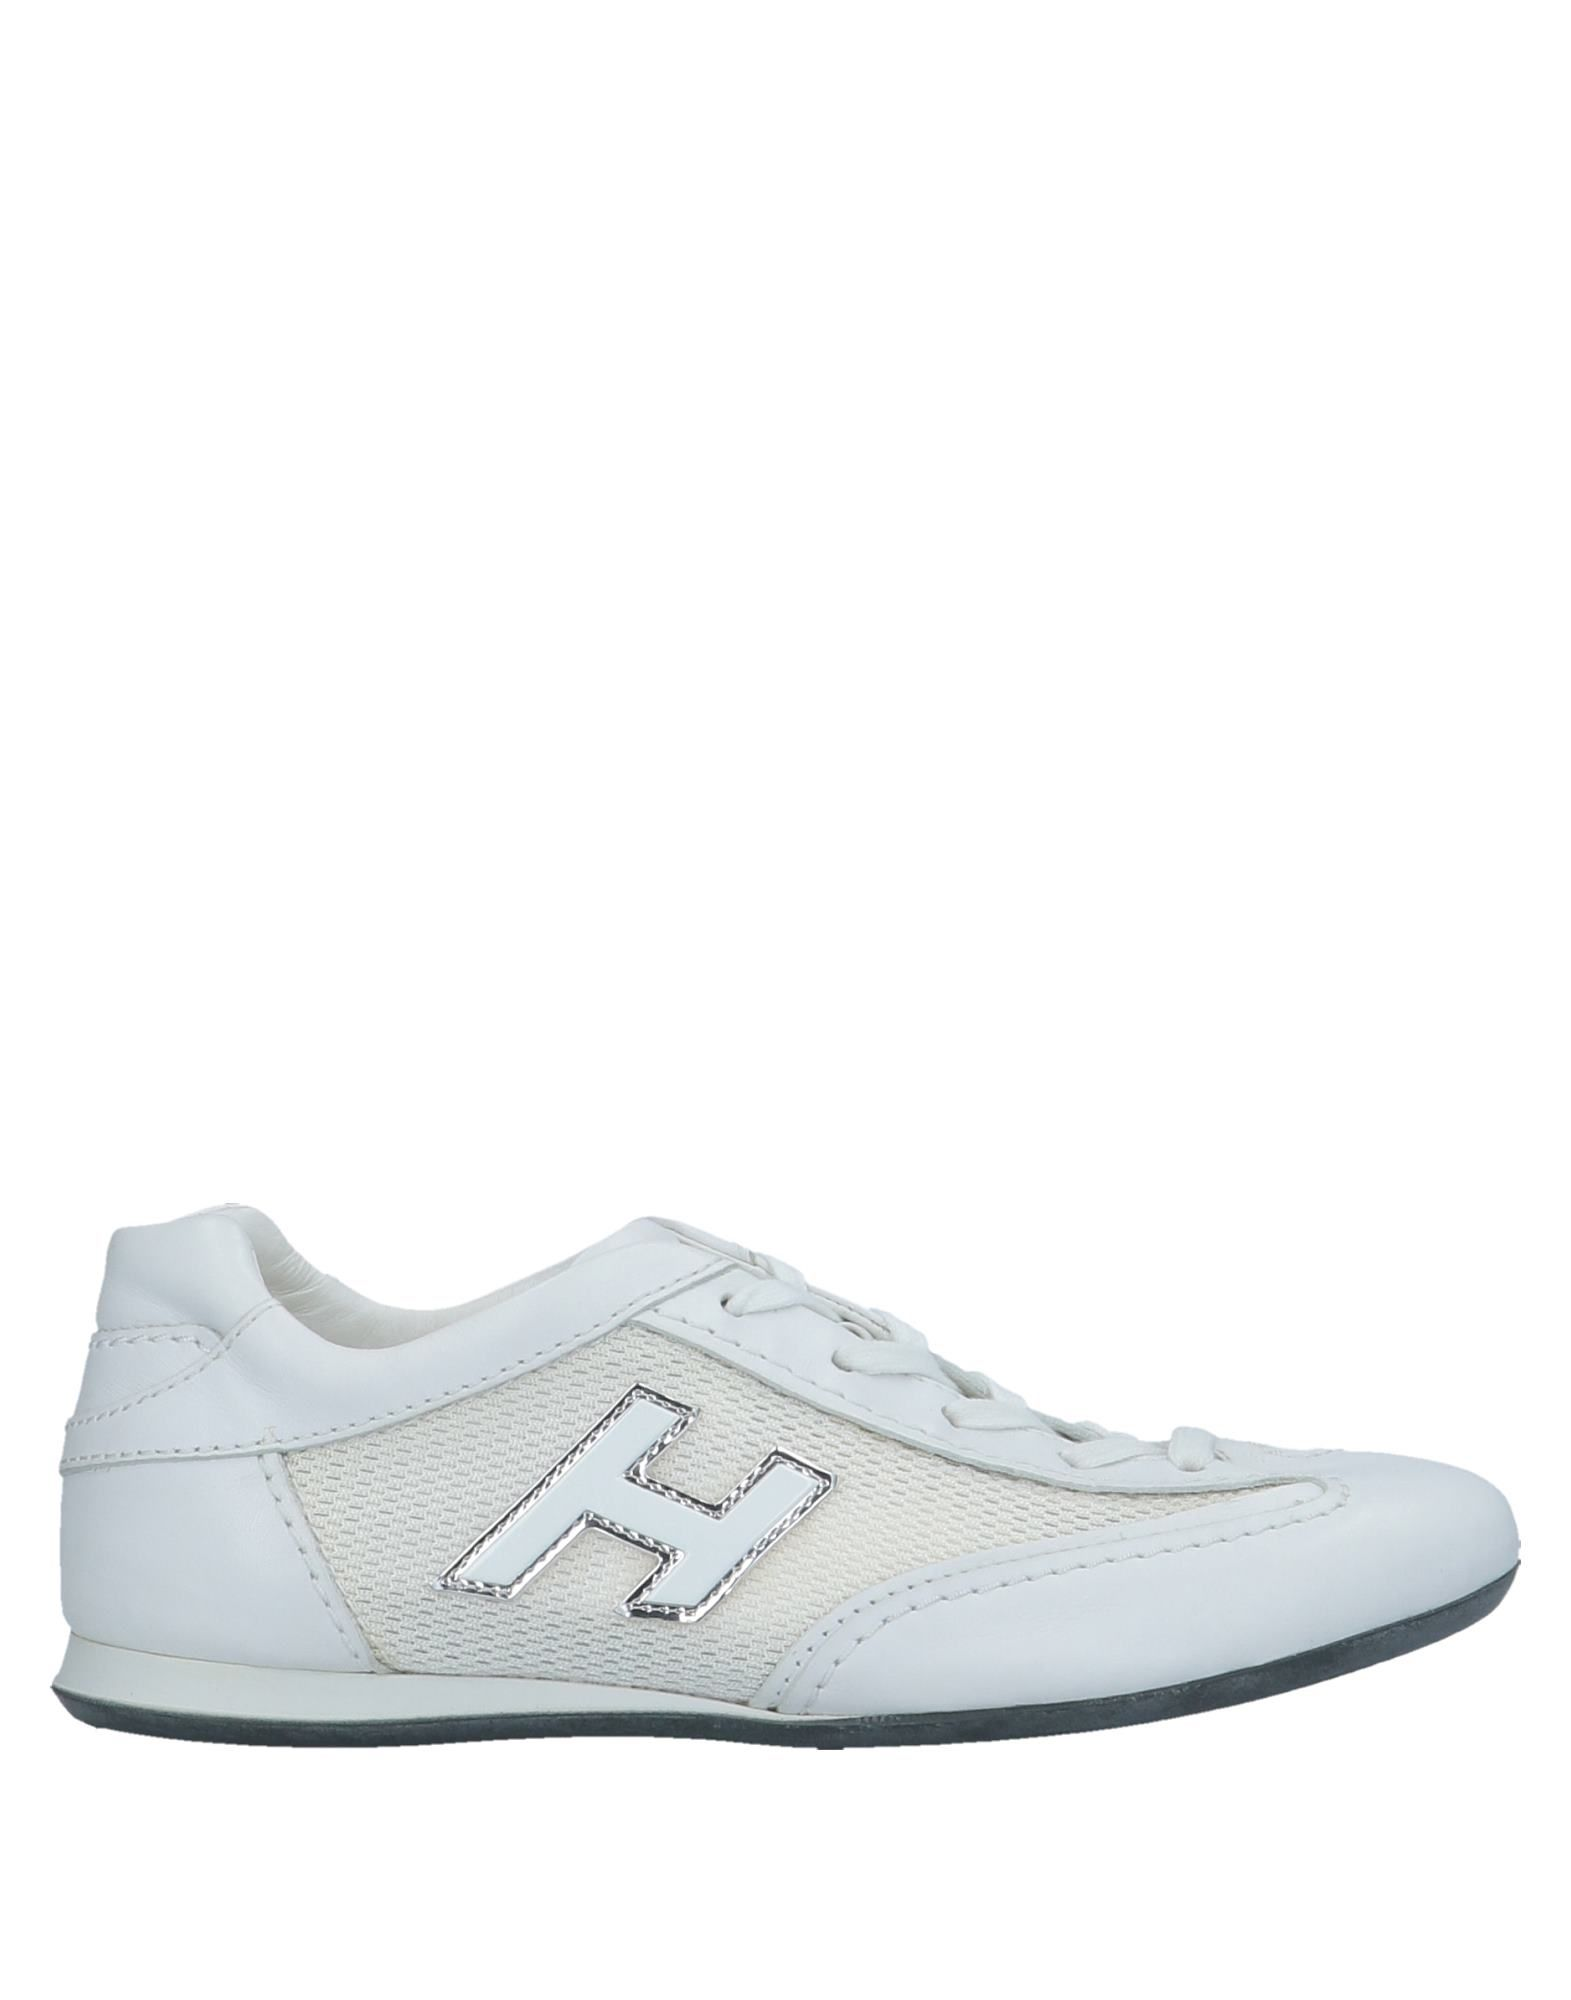 Hogan Sneakers Damen  11517203KGGut aussehende strapazierfähige Schuhe